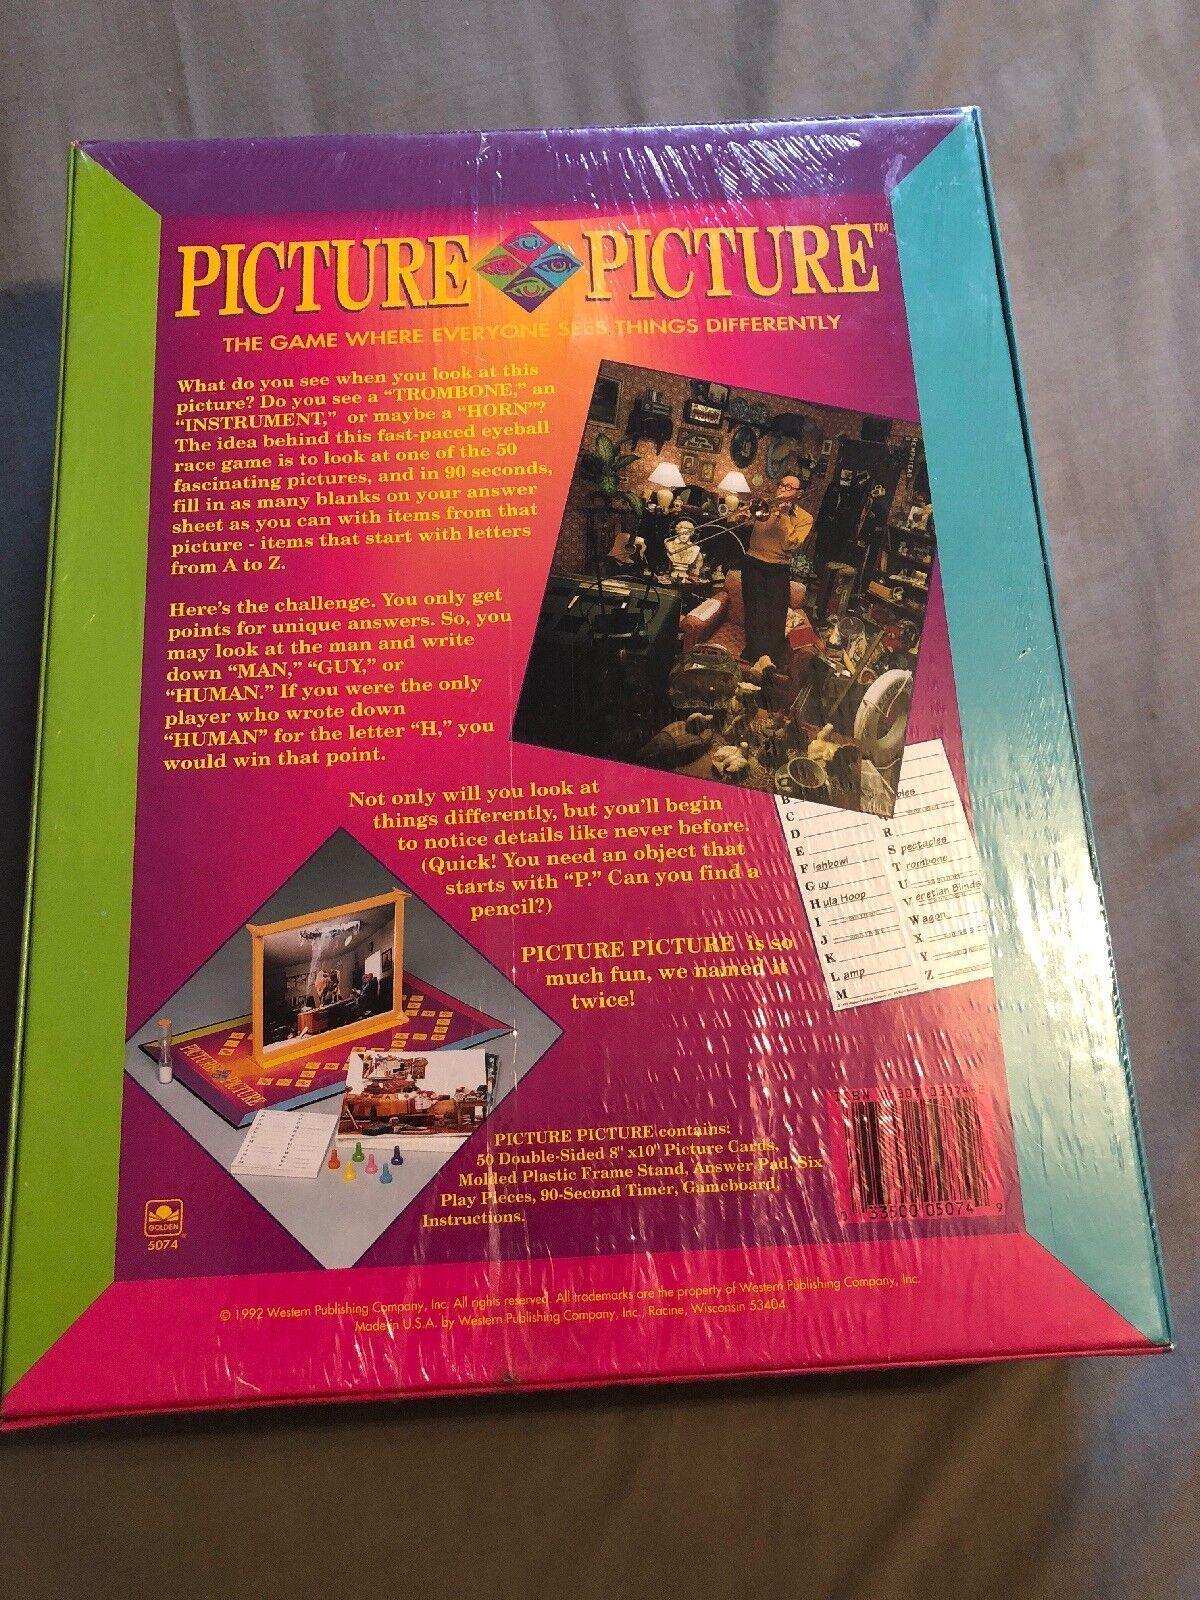 Quatre mers, Xiangyun, Fulai, cadeau du Nouvel An, non-stop RARE RARE RARE USA jeu. Parfaite de 1992. Nouveau & Sealed 86bd6e